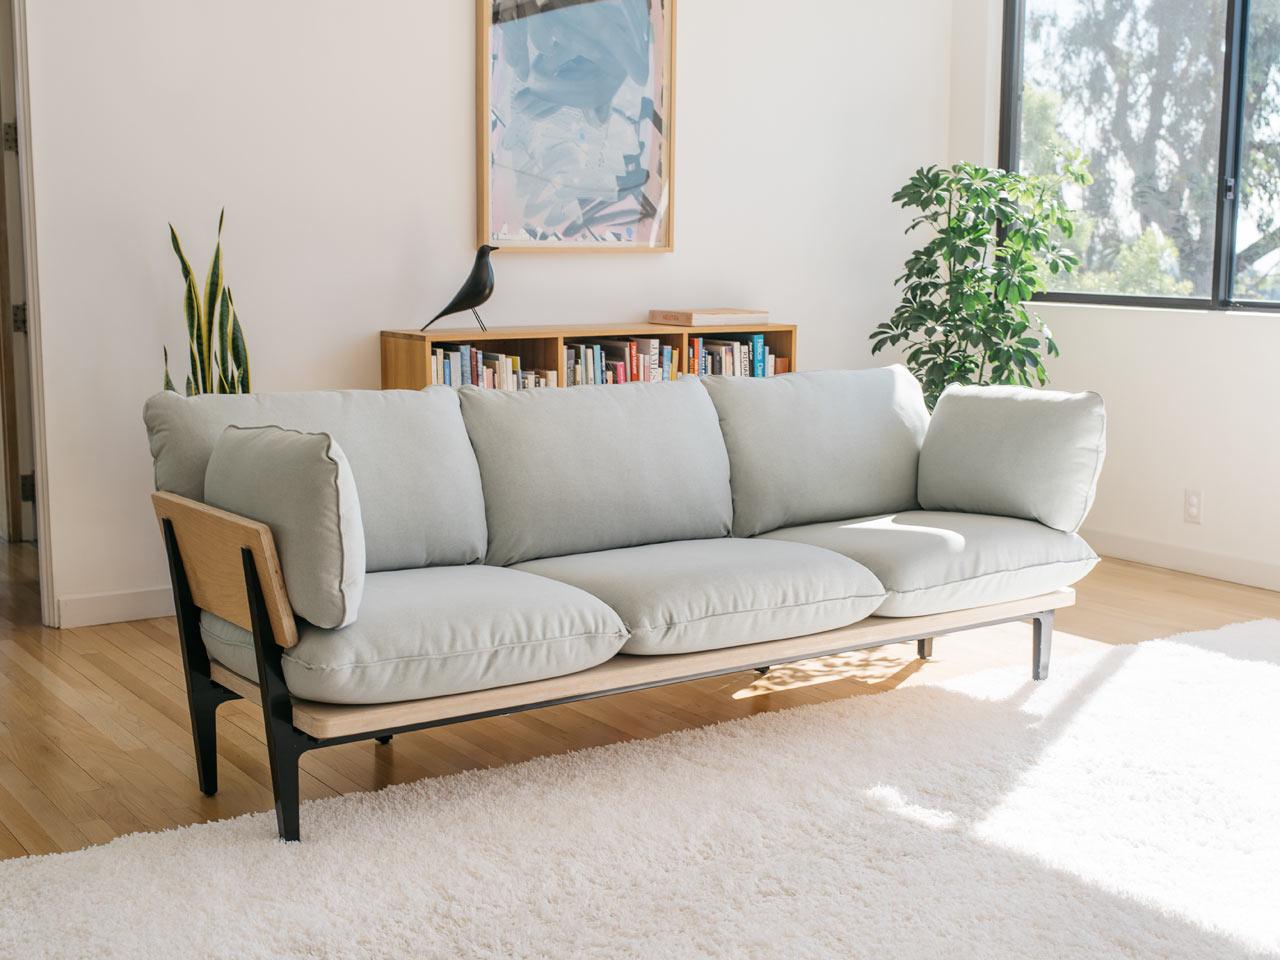 Floyd Is Back with the Modular Floyd Sofa